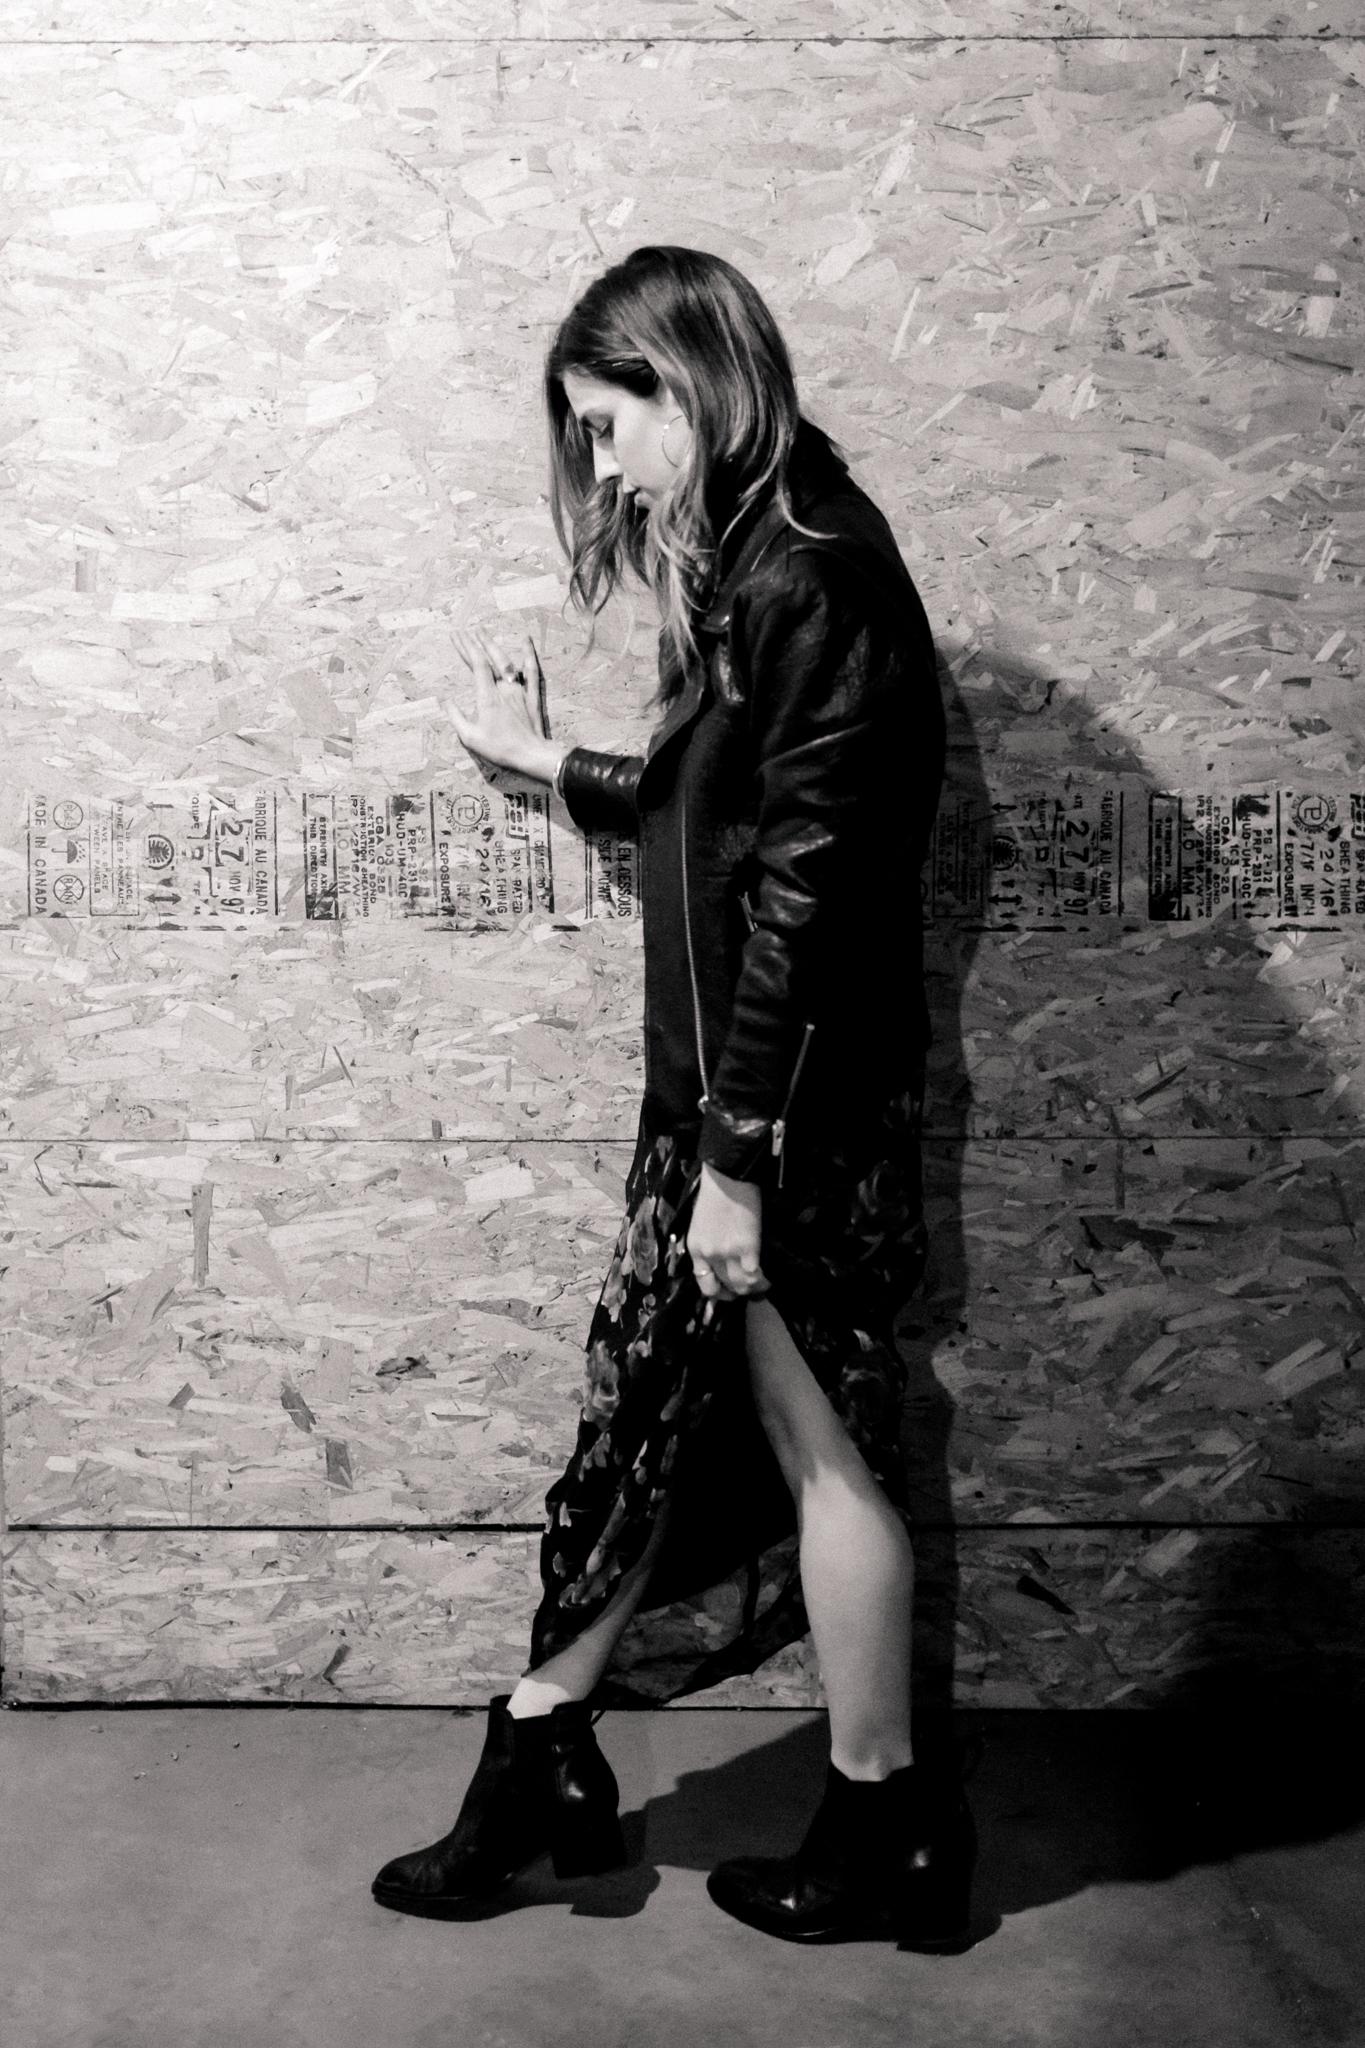 anna_e_cottrell_eldridge_edit_rose_noir_fashion_blogger_vintage_90s_rose maxi_dress_veda_black_leather_jayne_jacket_rag_and_bone_chelsea_boot_styling_mgb_photo_4.jpg